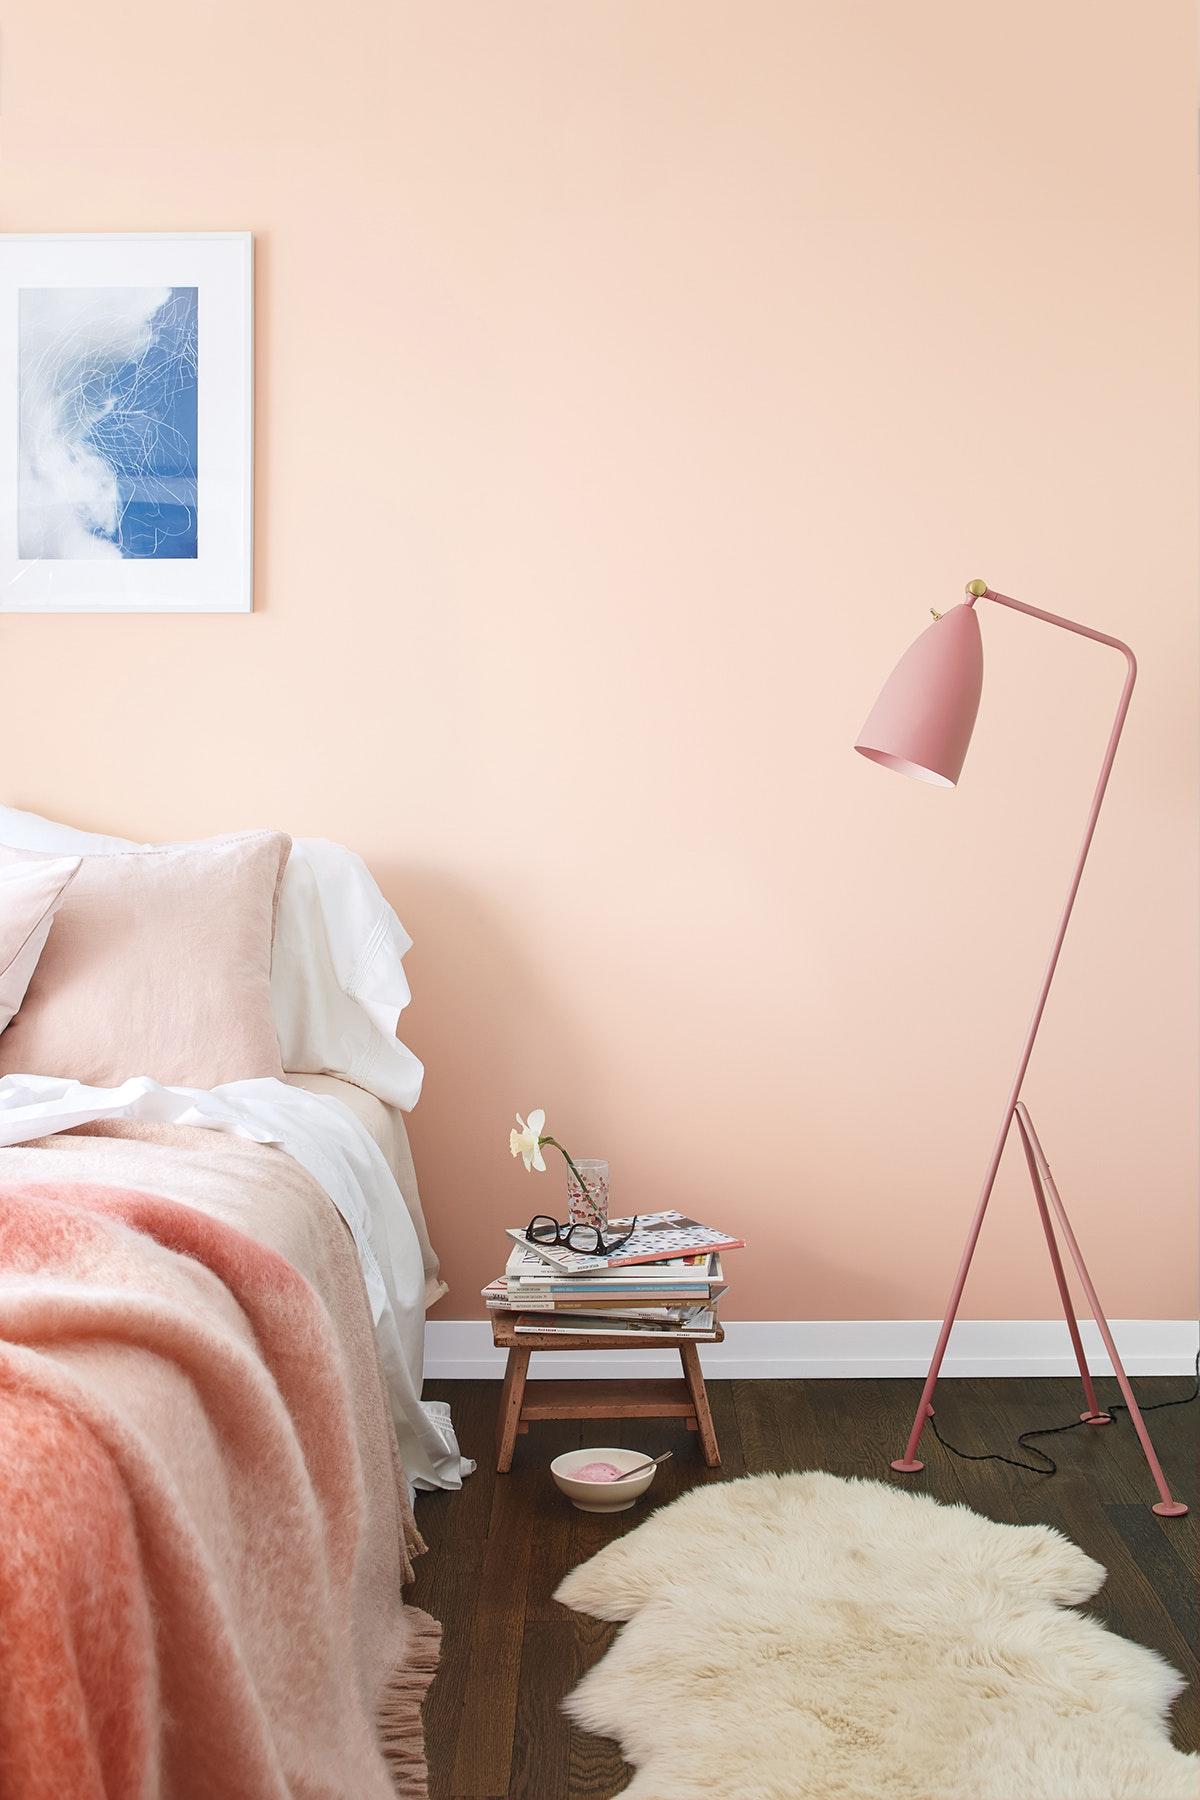 21 Minimalist Bedroom Ideas That Feel Cozy And Serene Purewow